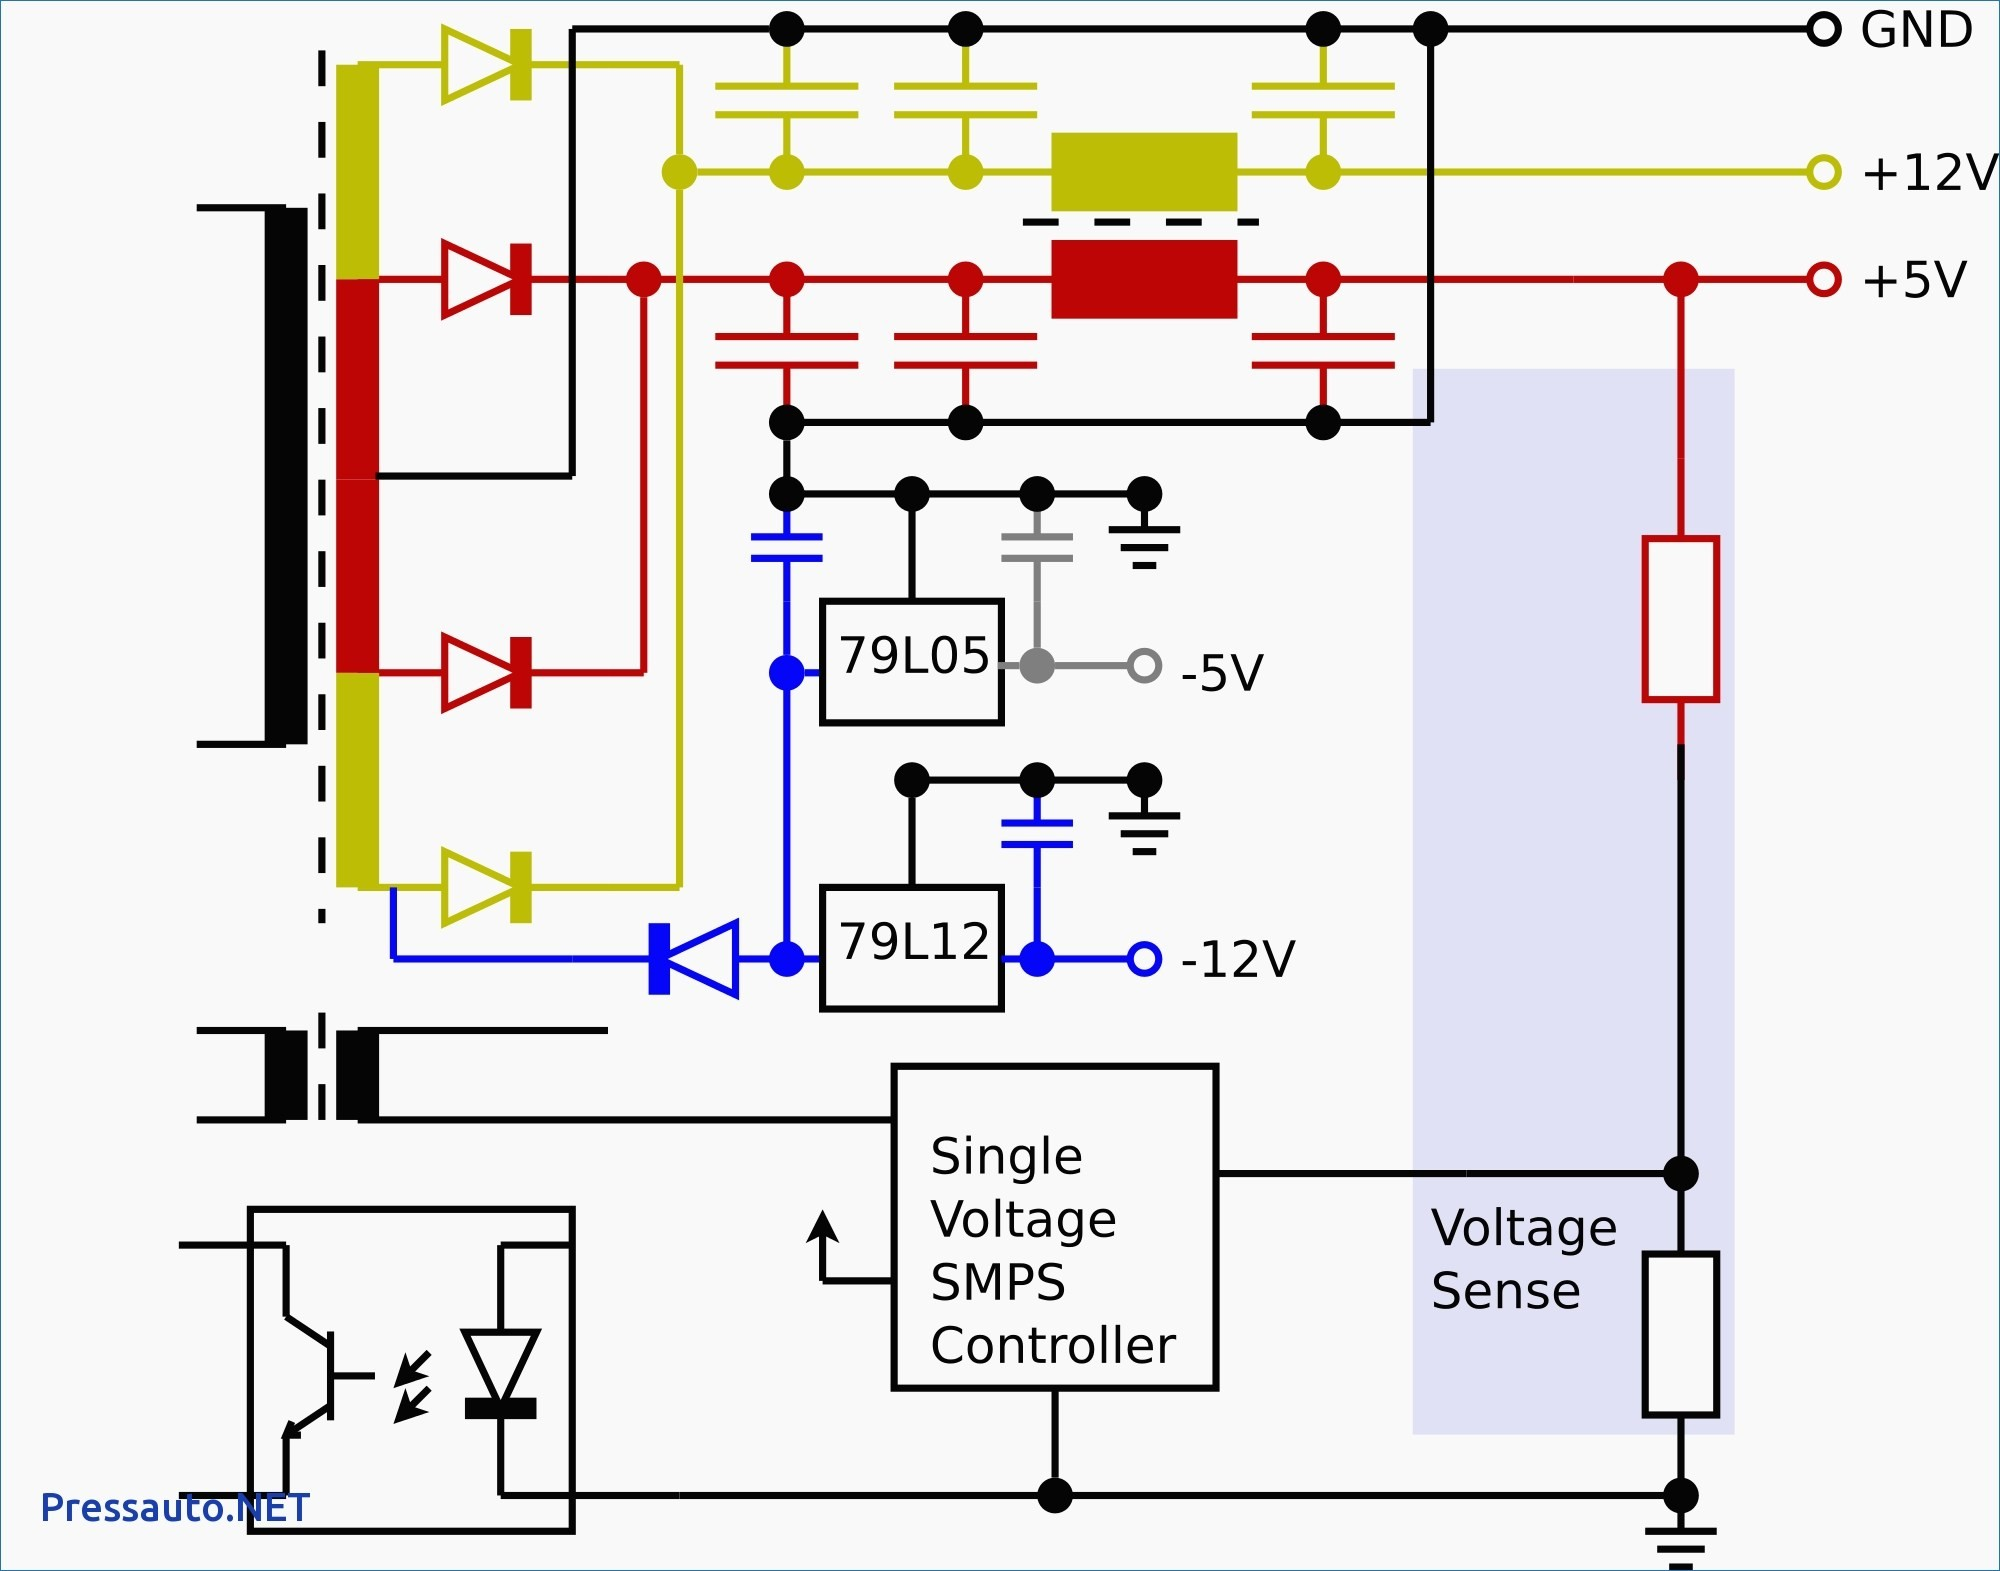 24v Transformer Wiring Diagram Dayton Contactors Phase 5th Power Converter For 12V